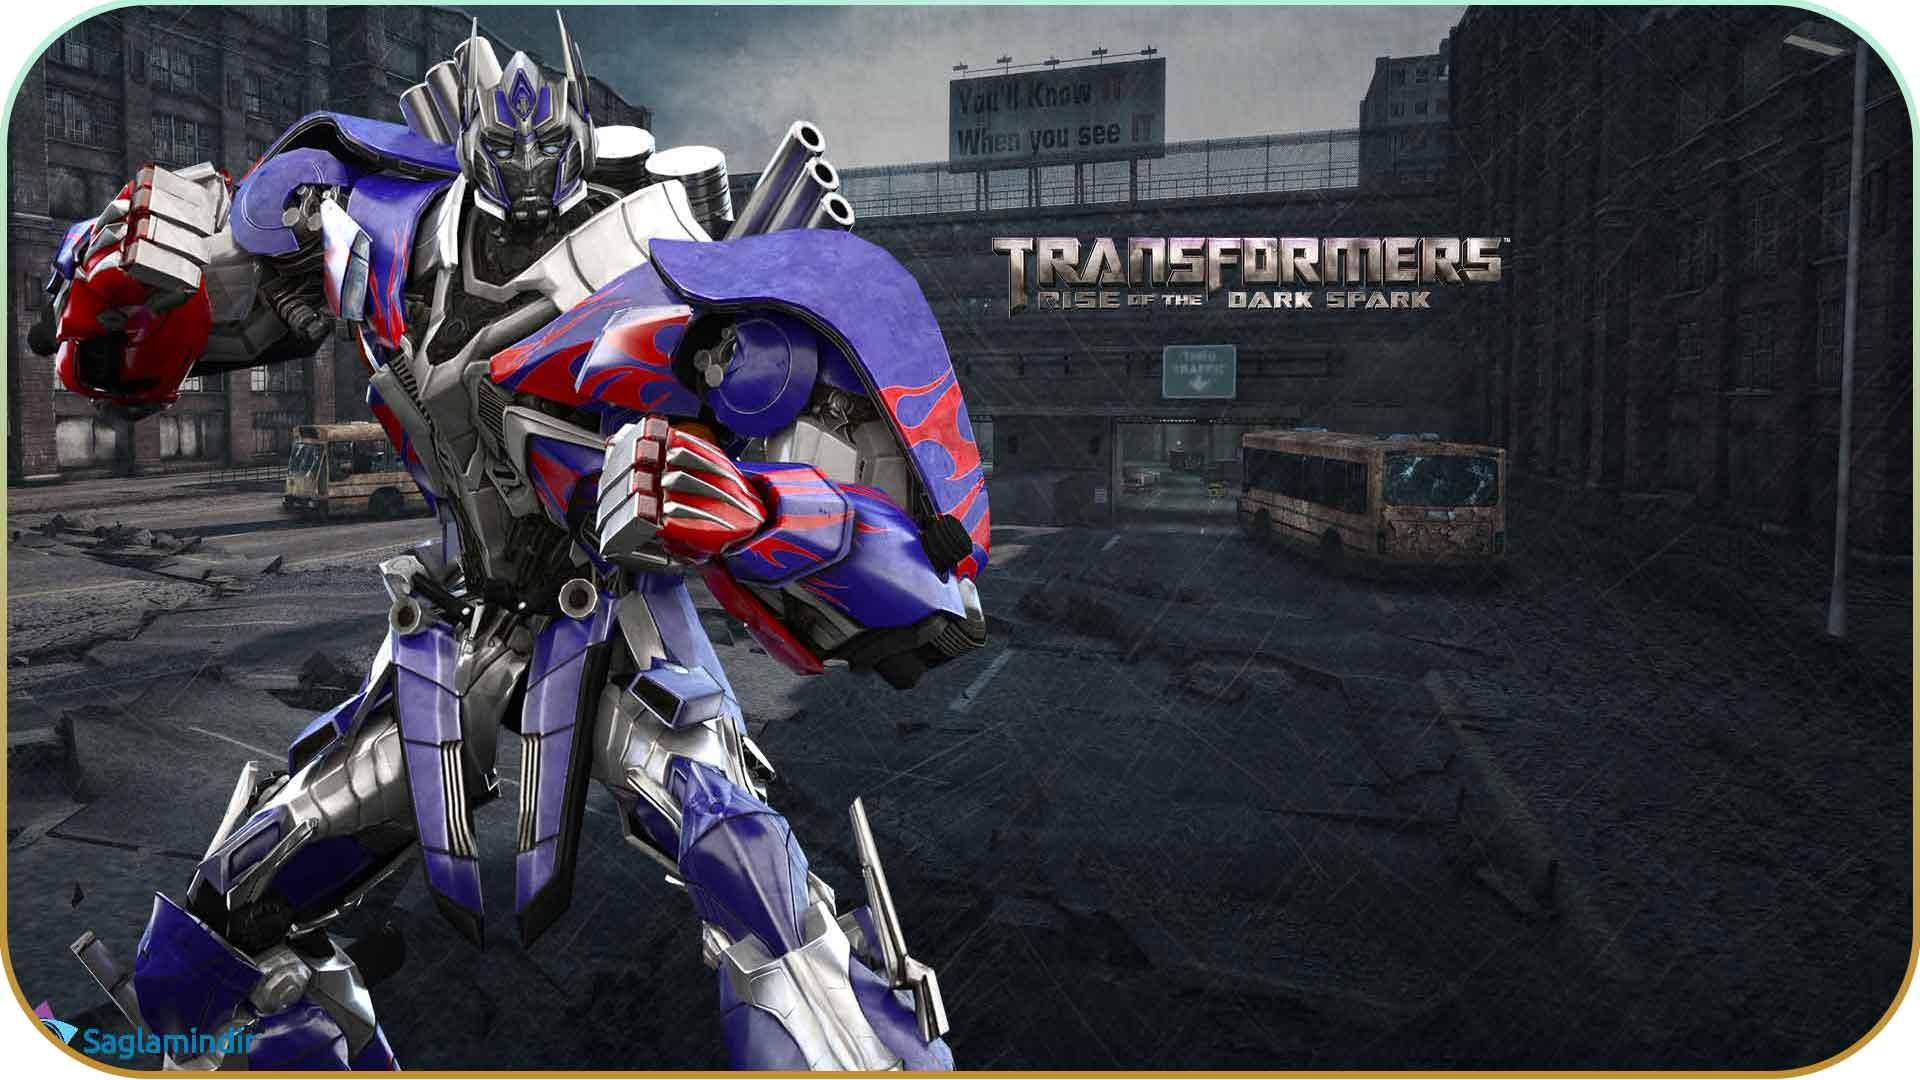 Transformers Rise of the Dark Spark saglamindir